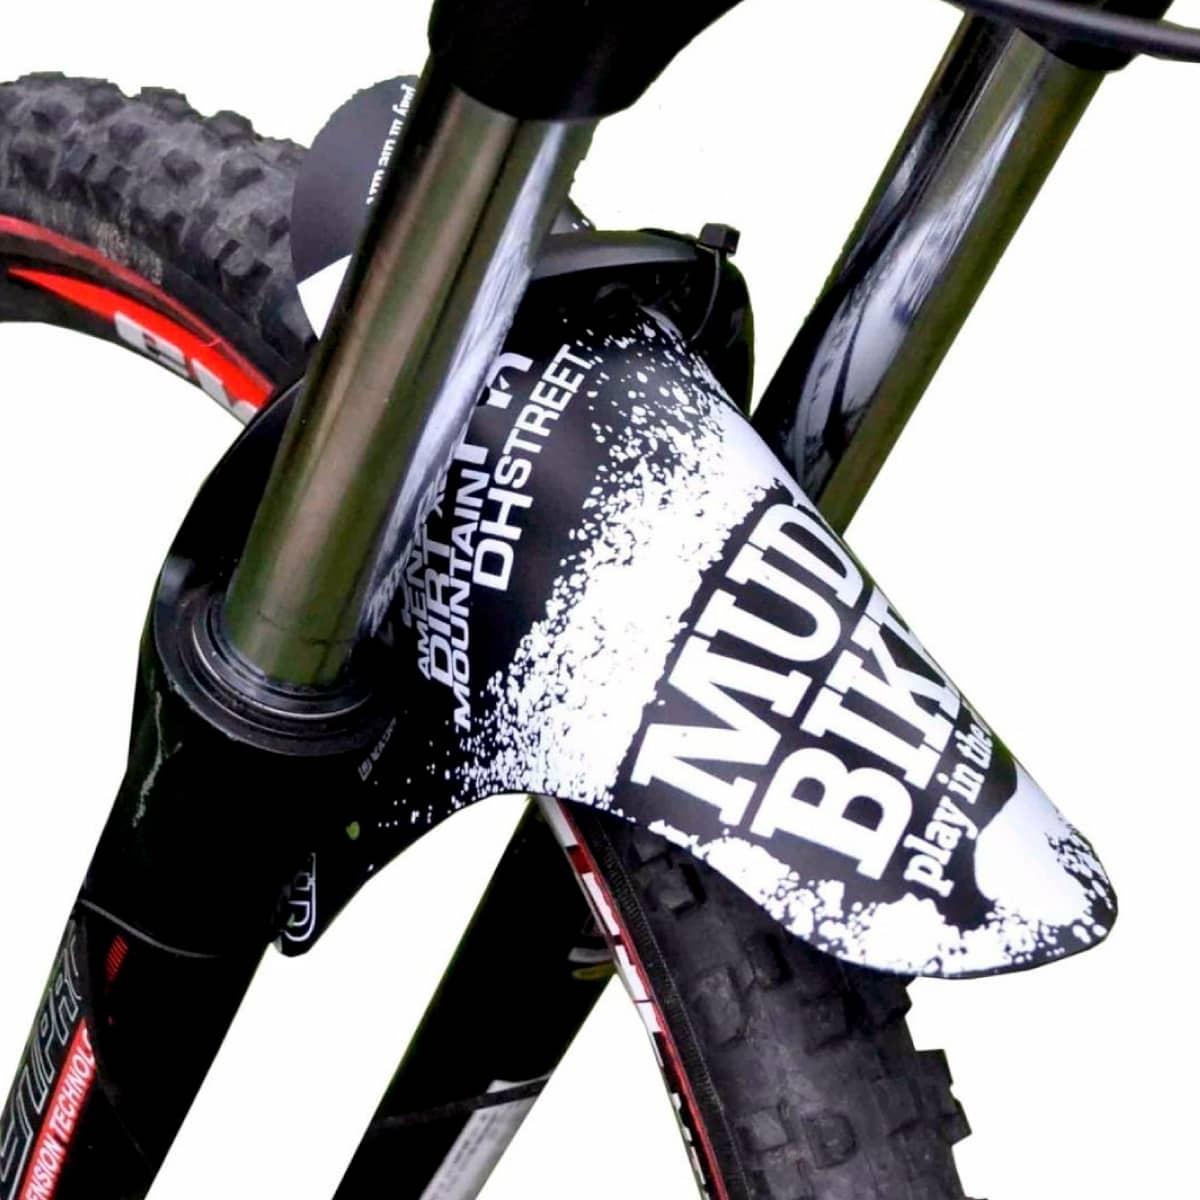 Paralama Mtb Aro 29 e 26 Mud Bike Transparente